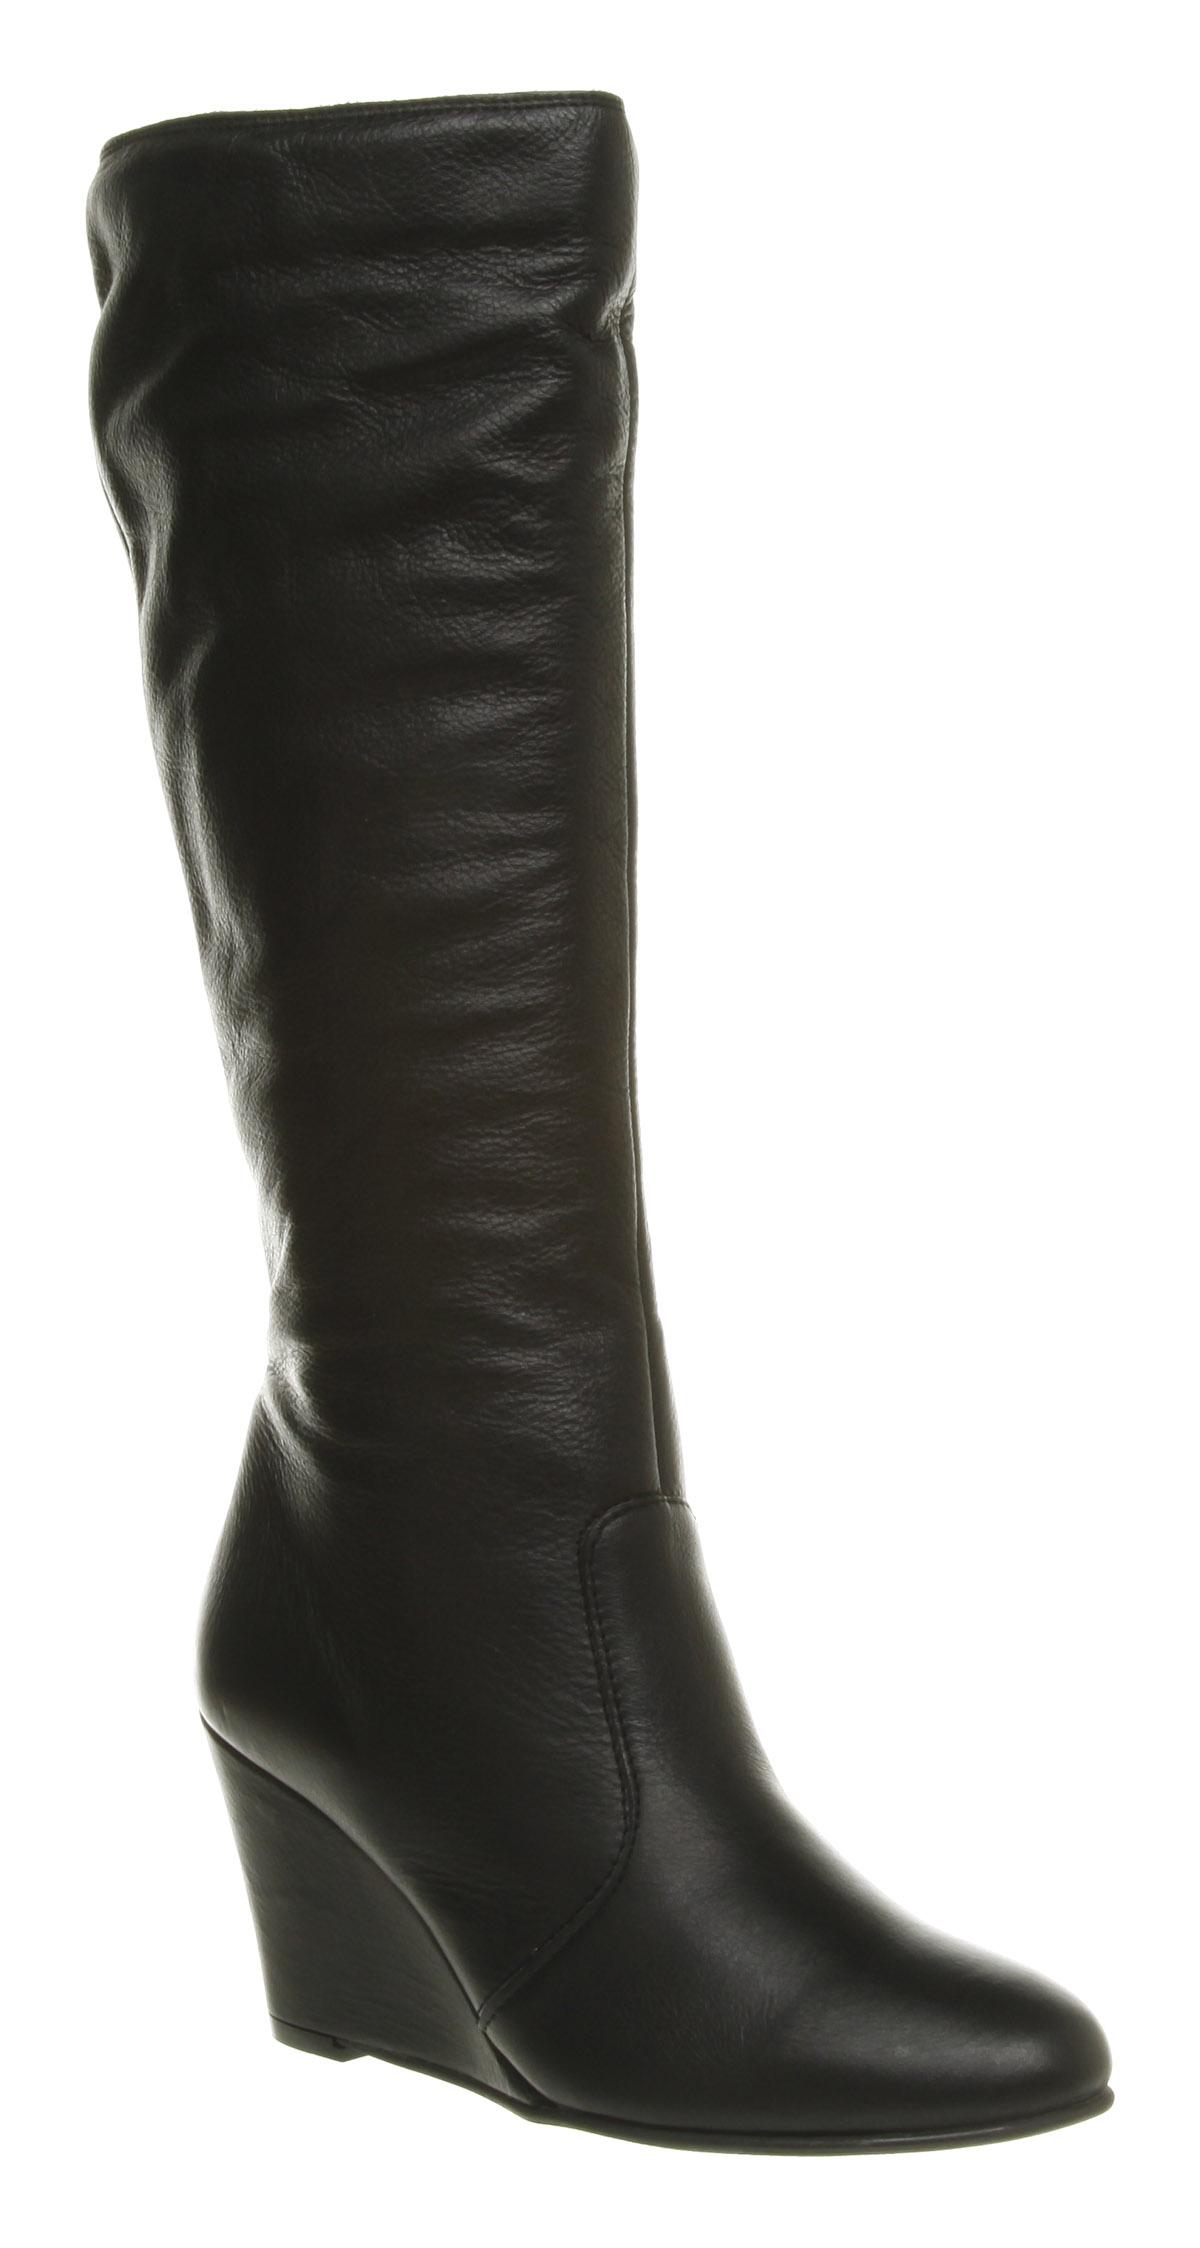 office jena plain zip wedge boot black leather in black lyst